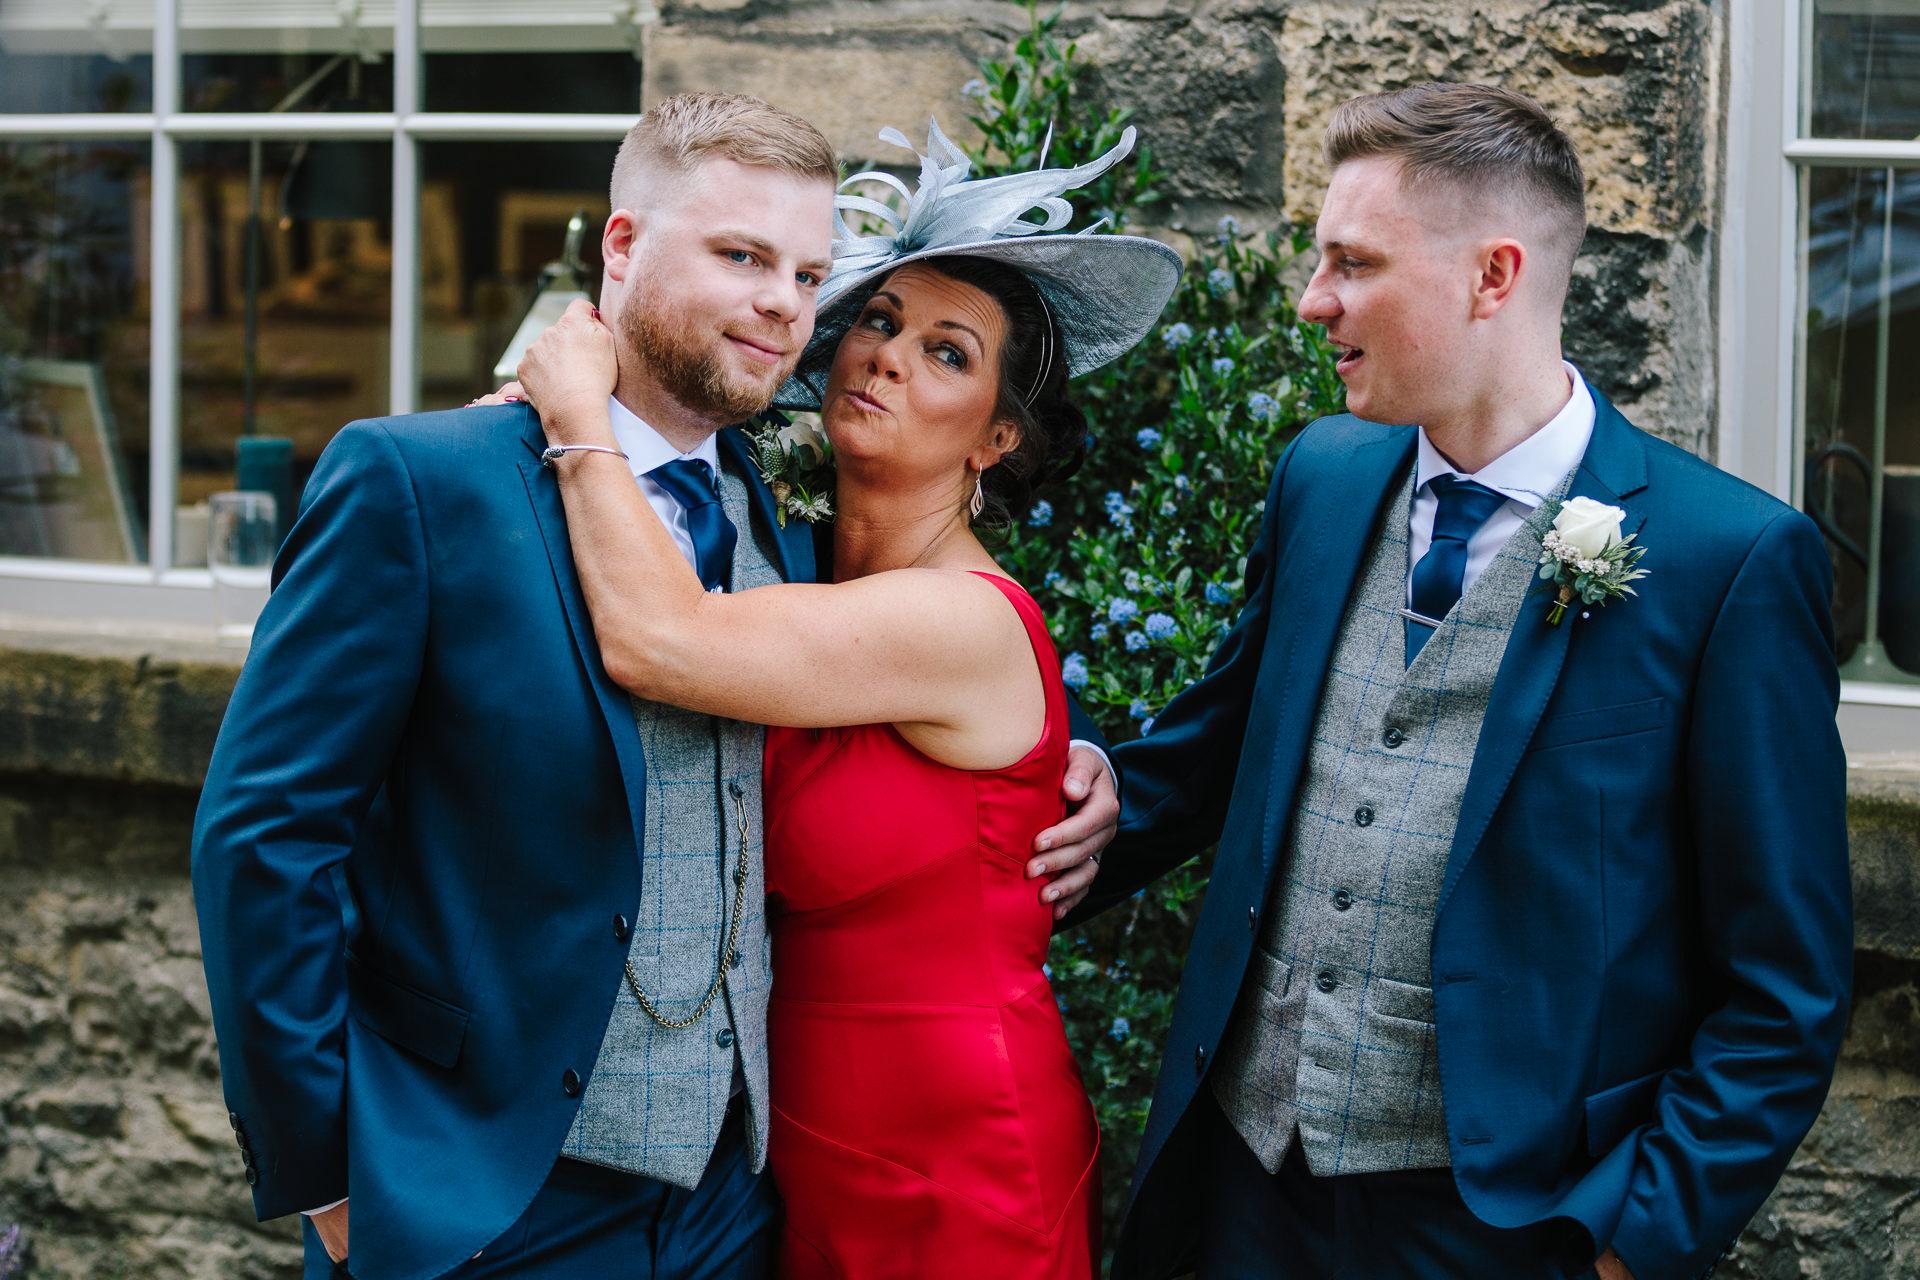 Holmes mill wedding lancashire bride and groom award winning